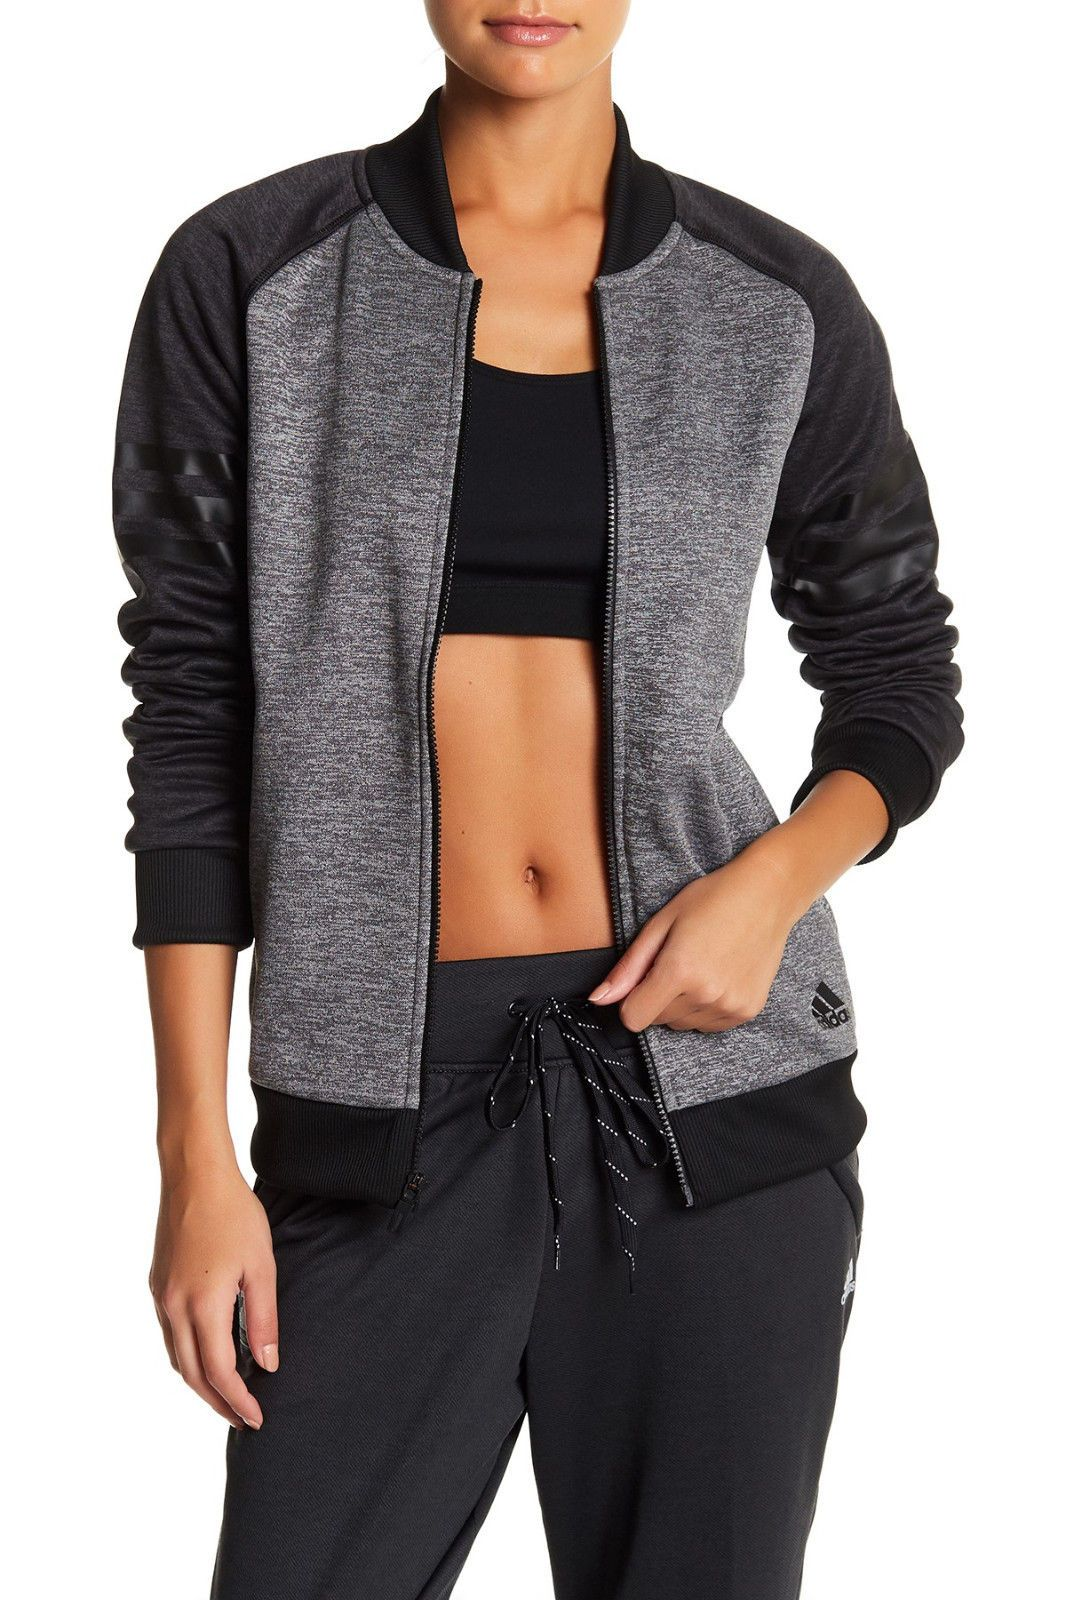 Womens Adidas TEAM ISSUE FLEECE JACKET Black Grey Zip Up Jacket NEW ... ea136c6fb